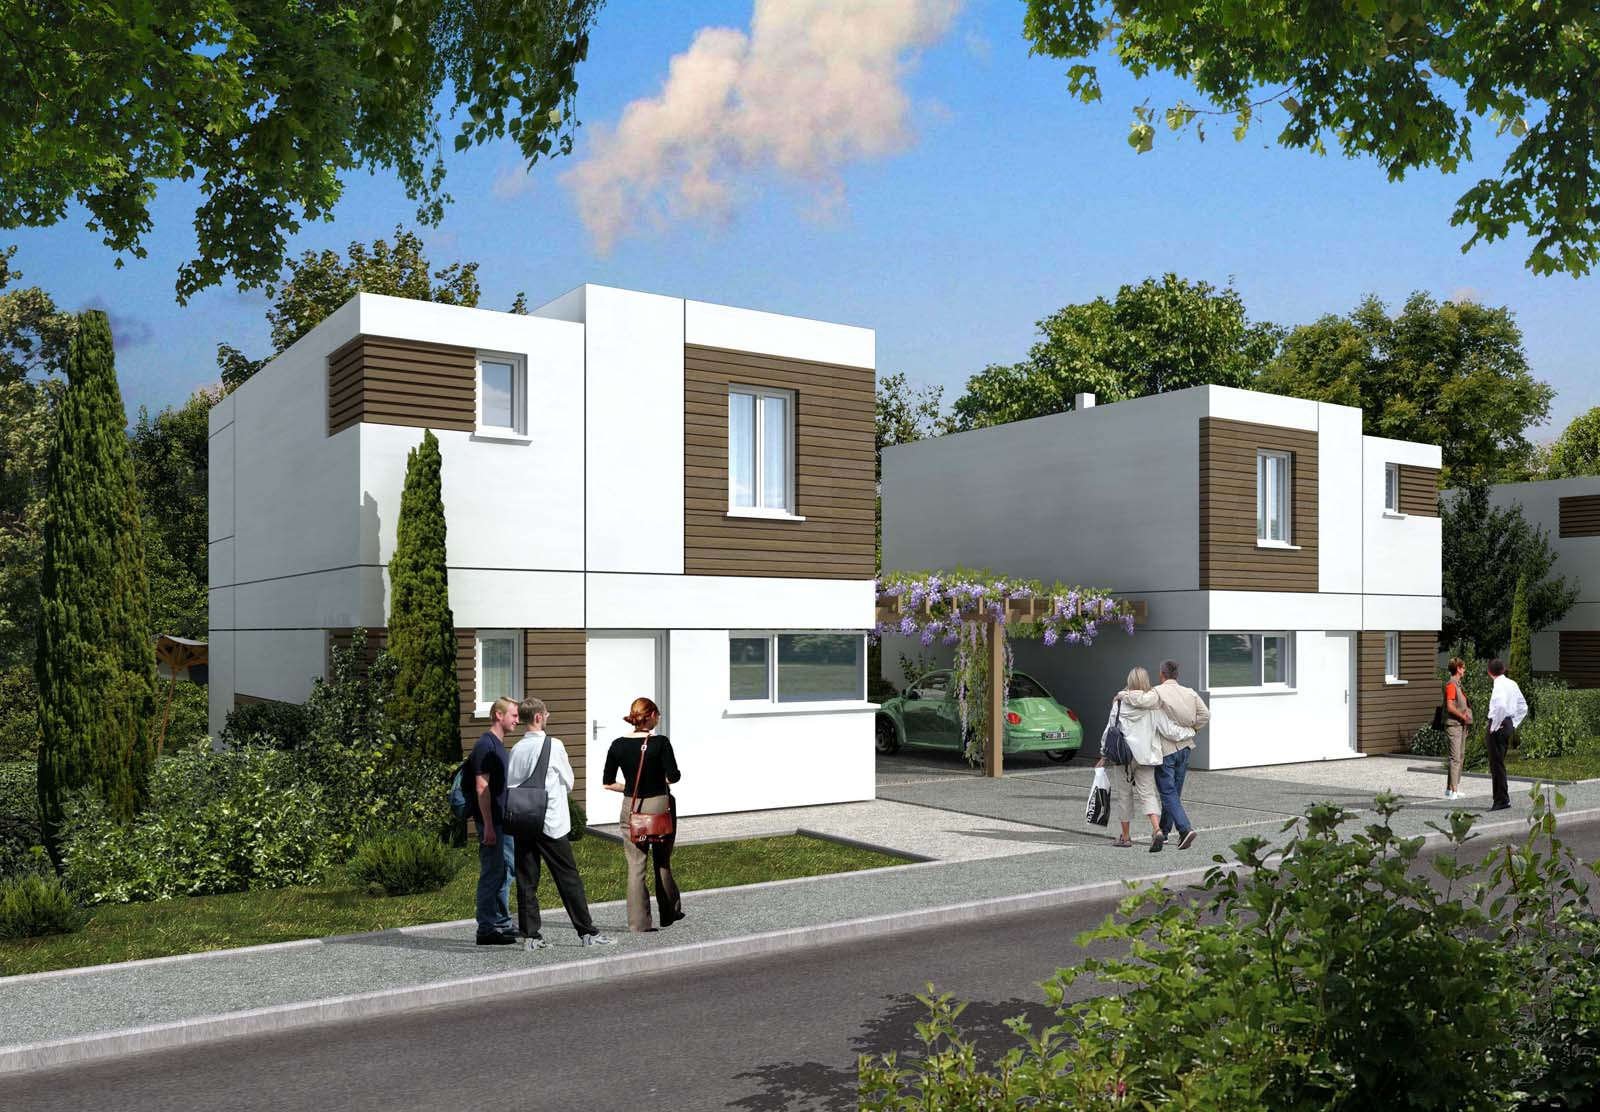 Christophe collignon maisons individuelles for Maisons individuelles